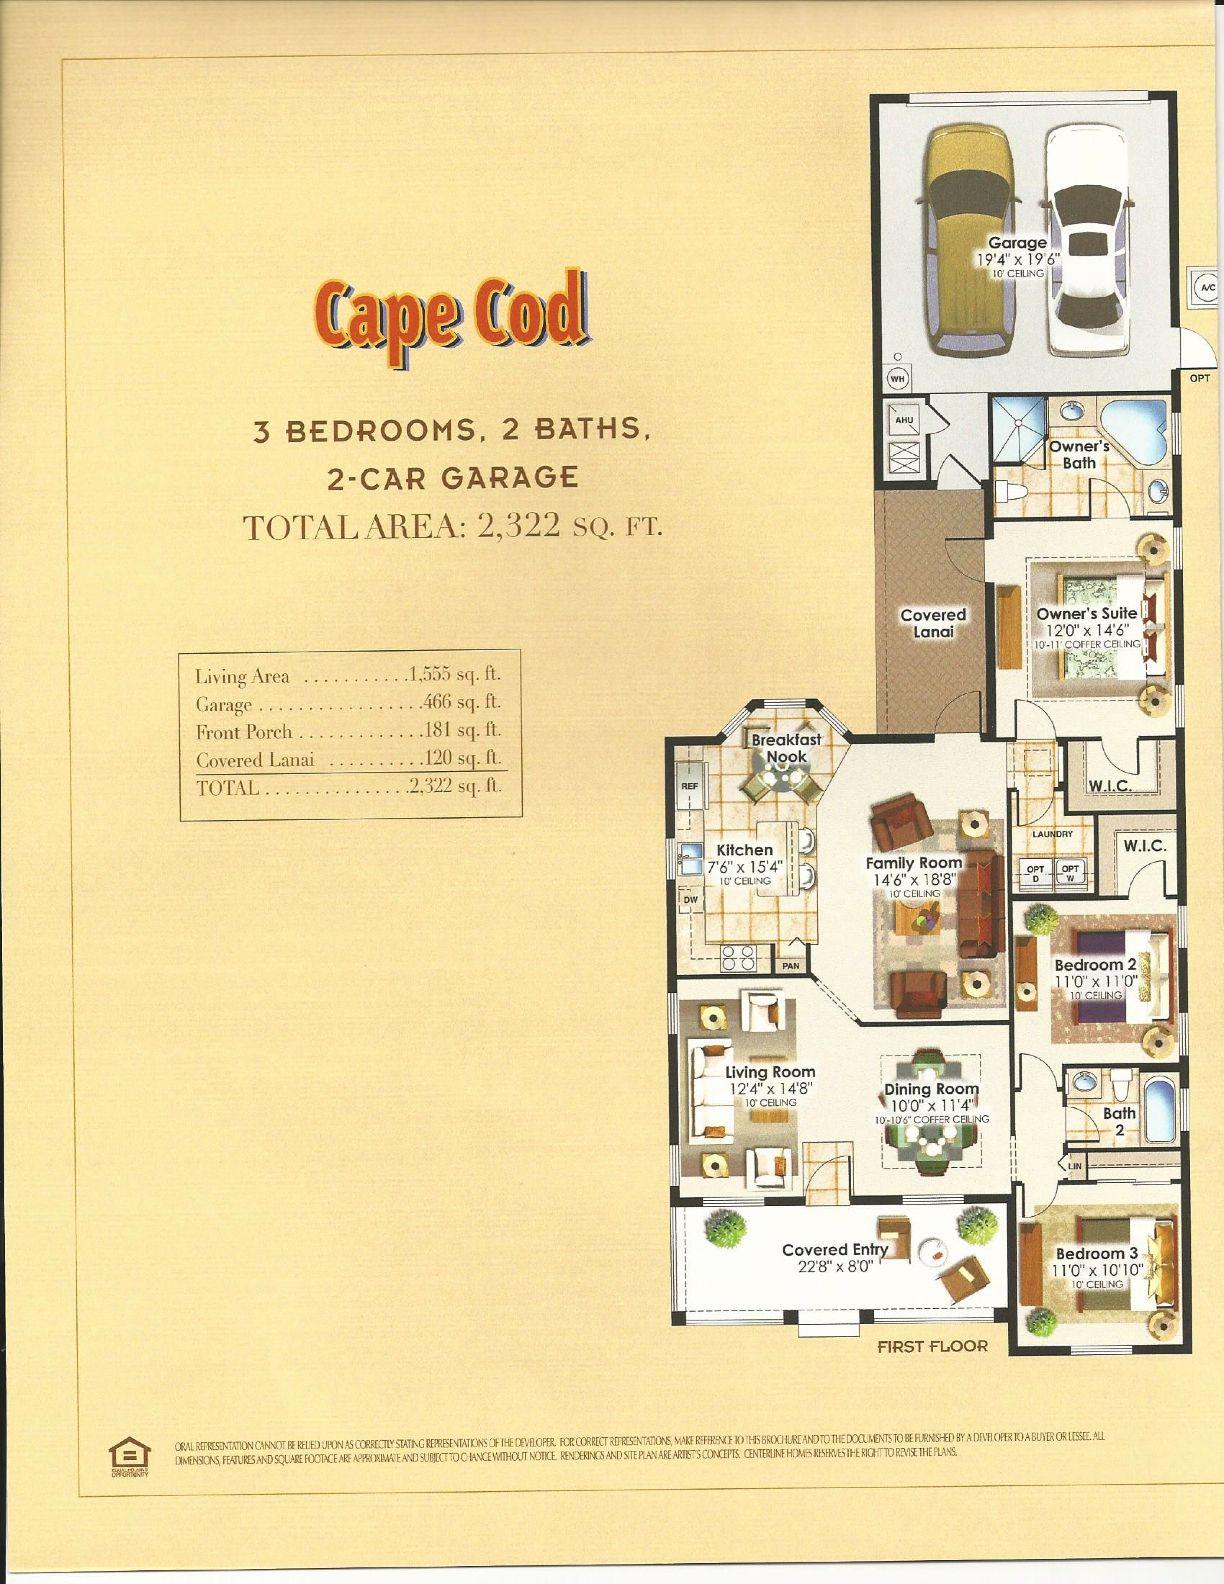 Summerlake Center Line Homes Gables Collection Cape Cod Floor Plan ...